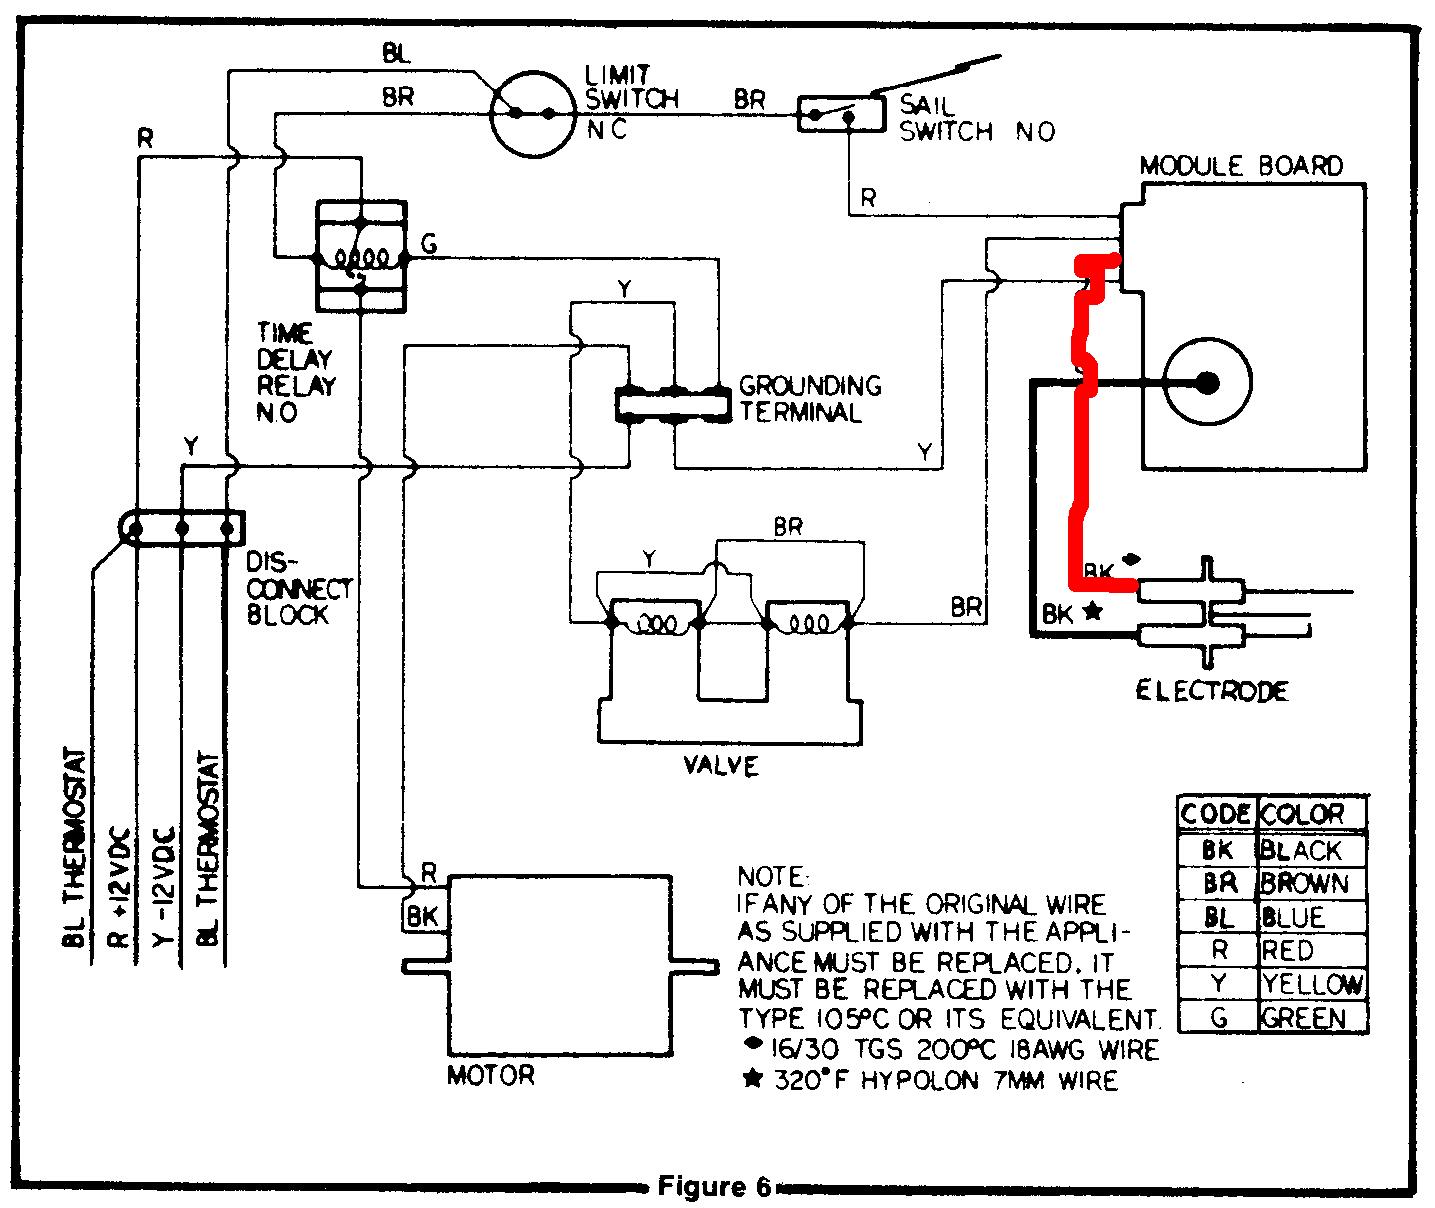 Wiring Diagram York Gas Furnace I Have   Manual E-Books - Gas Furnace Wiring Diagram